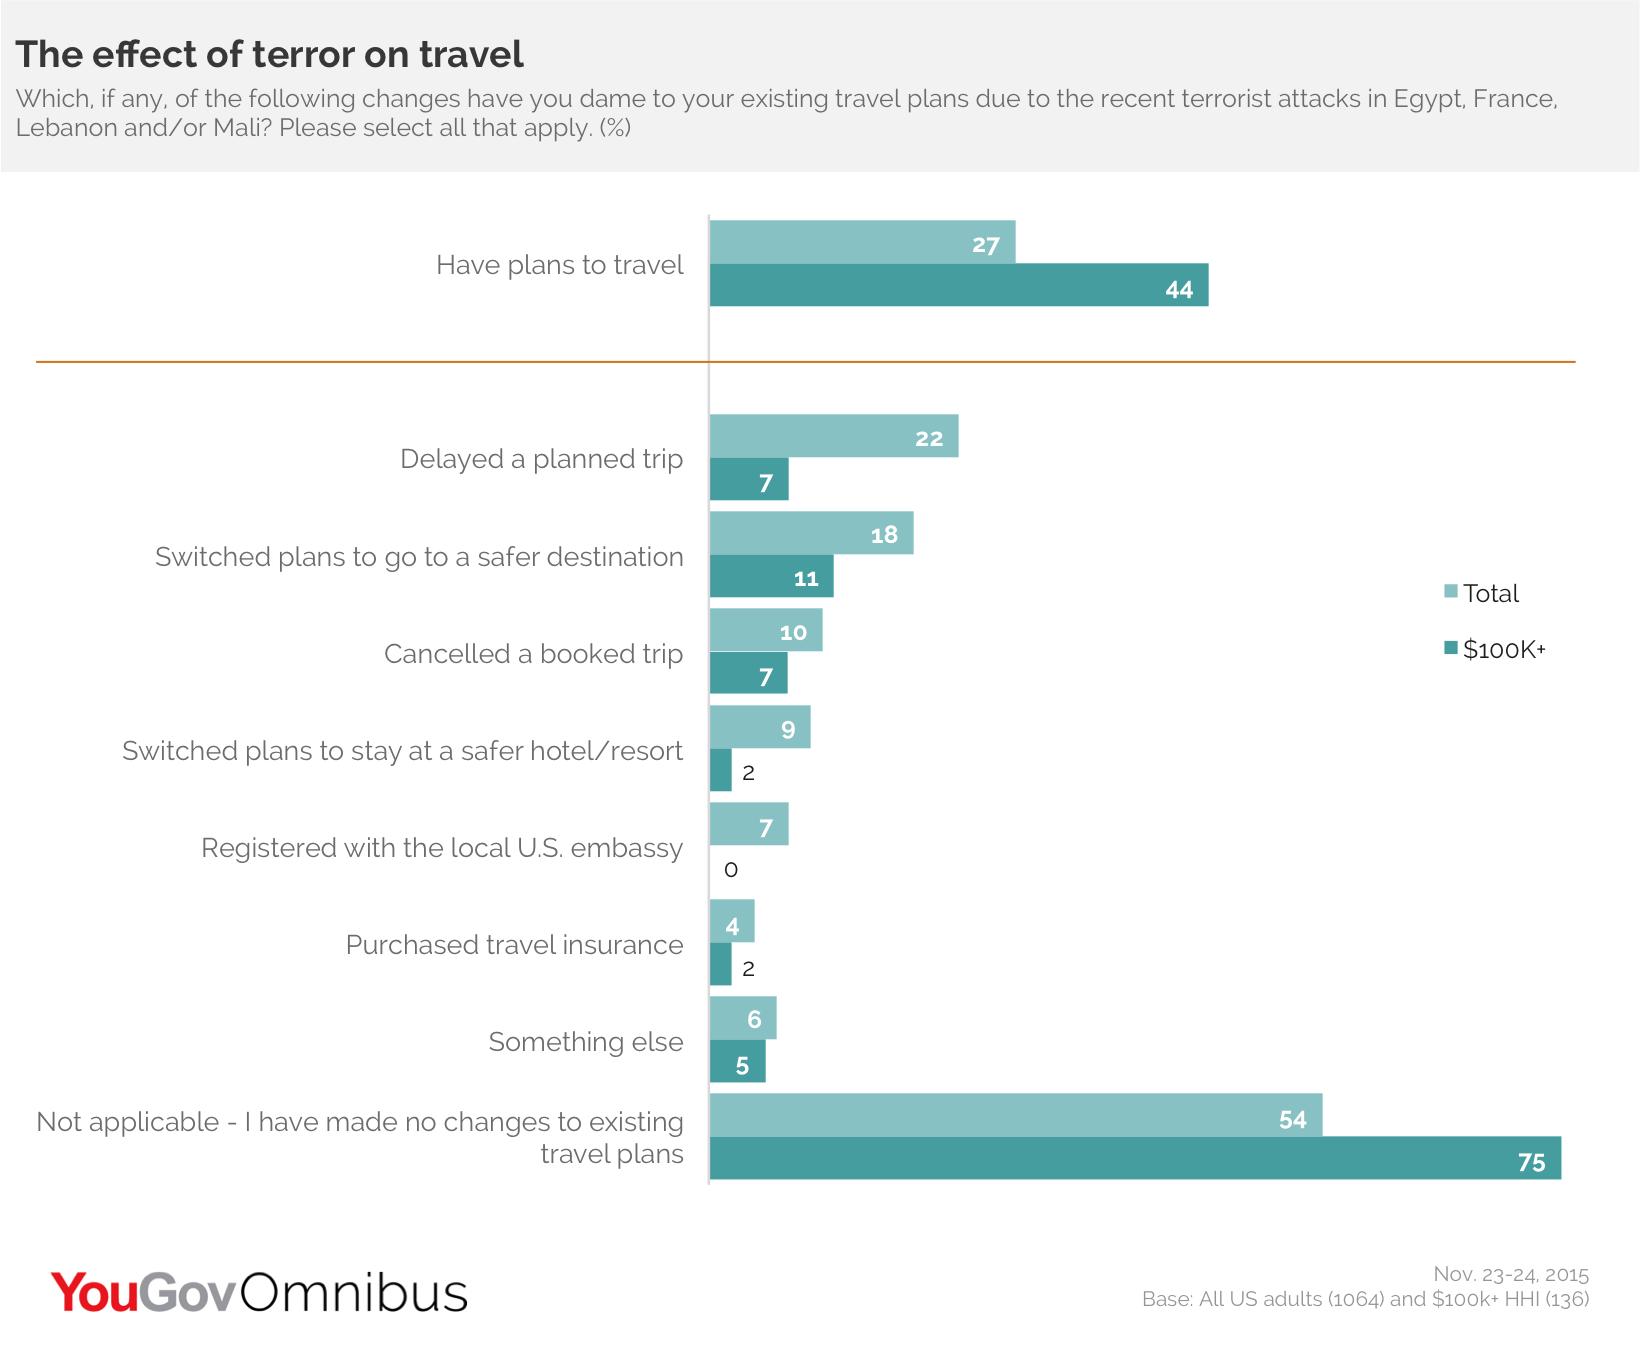 Effect of Terror on Travel